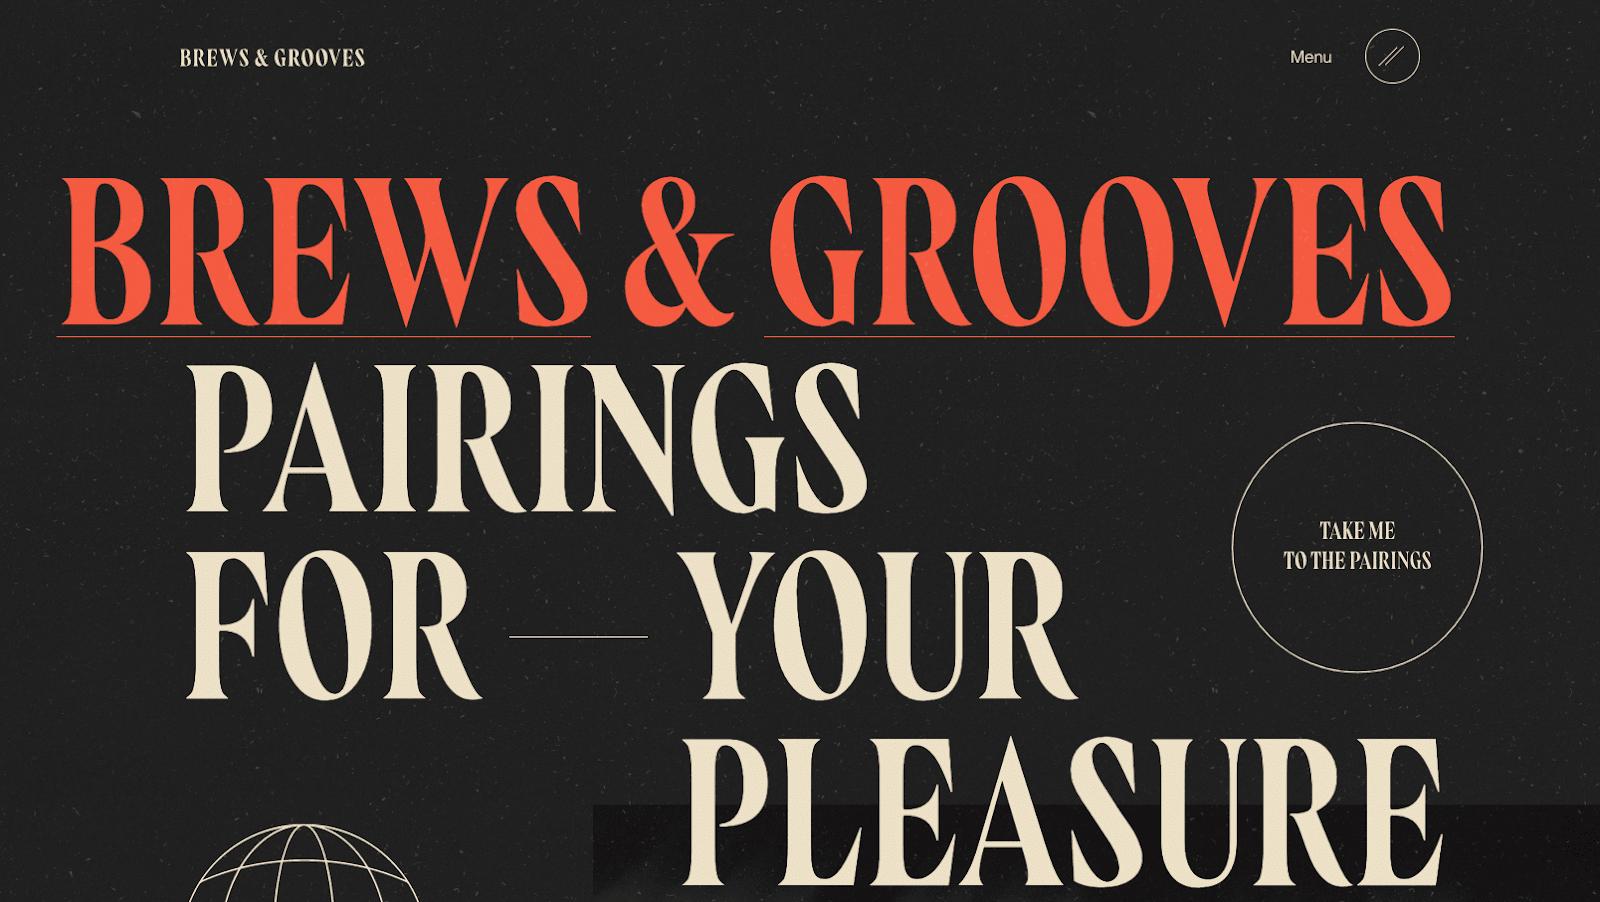 Brews & Grooves websites hero section